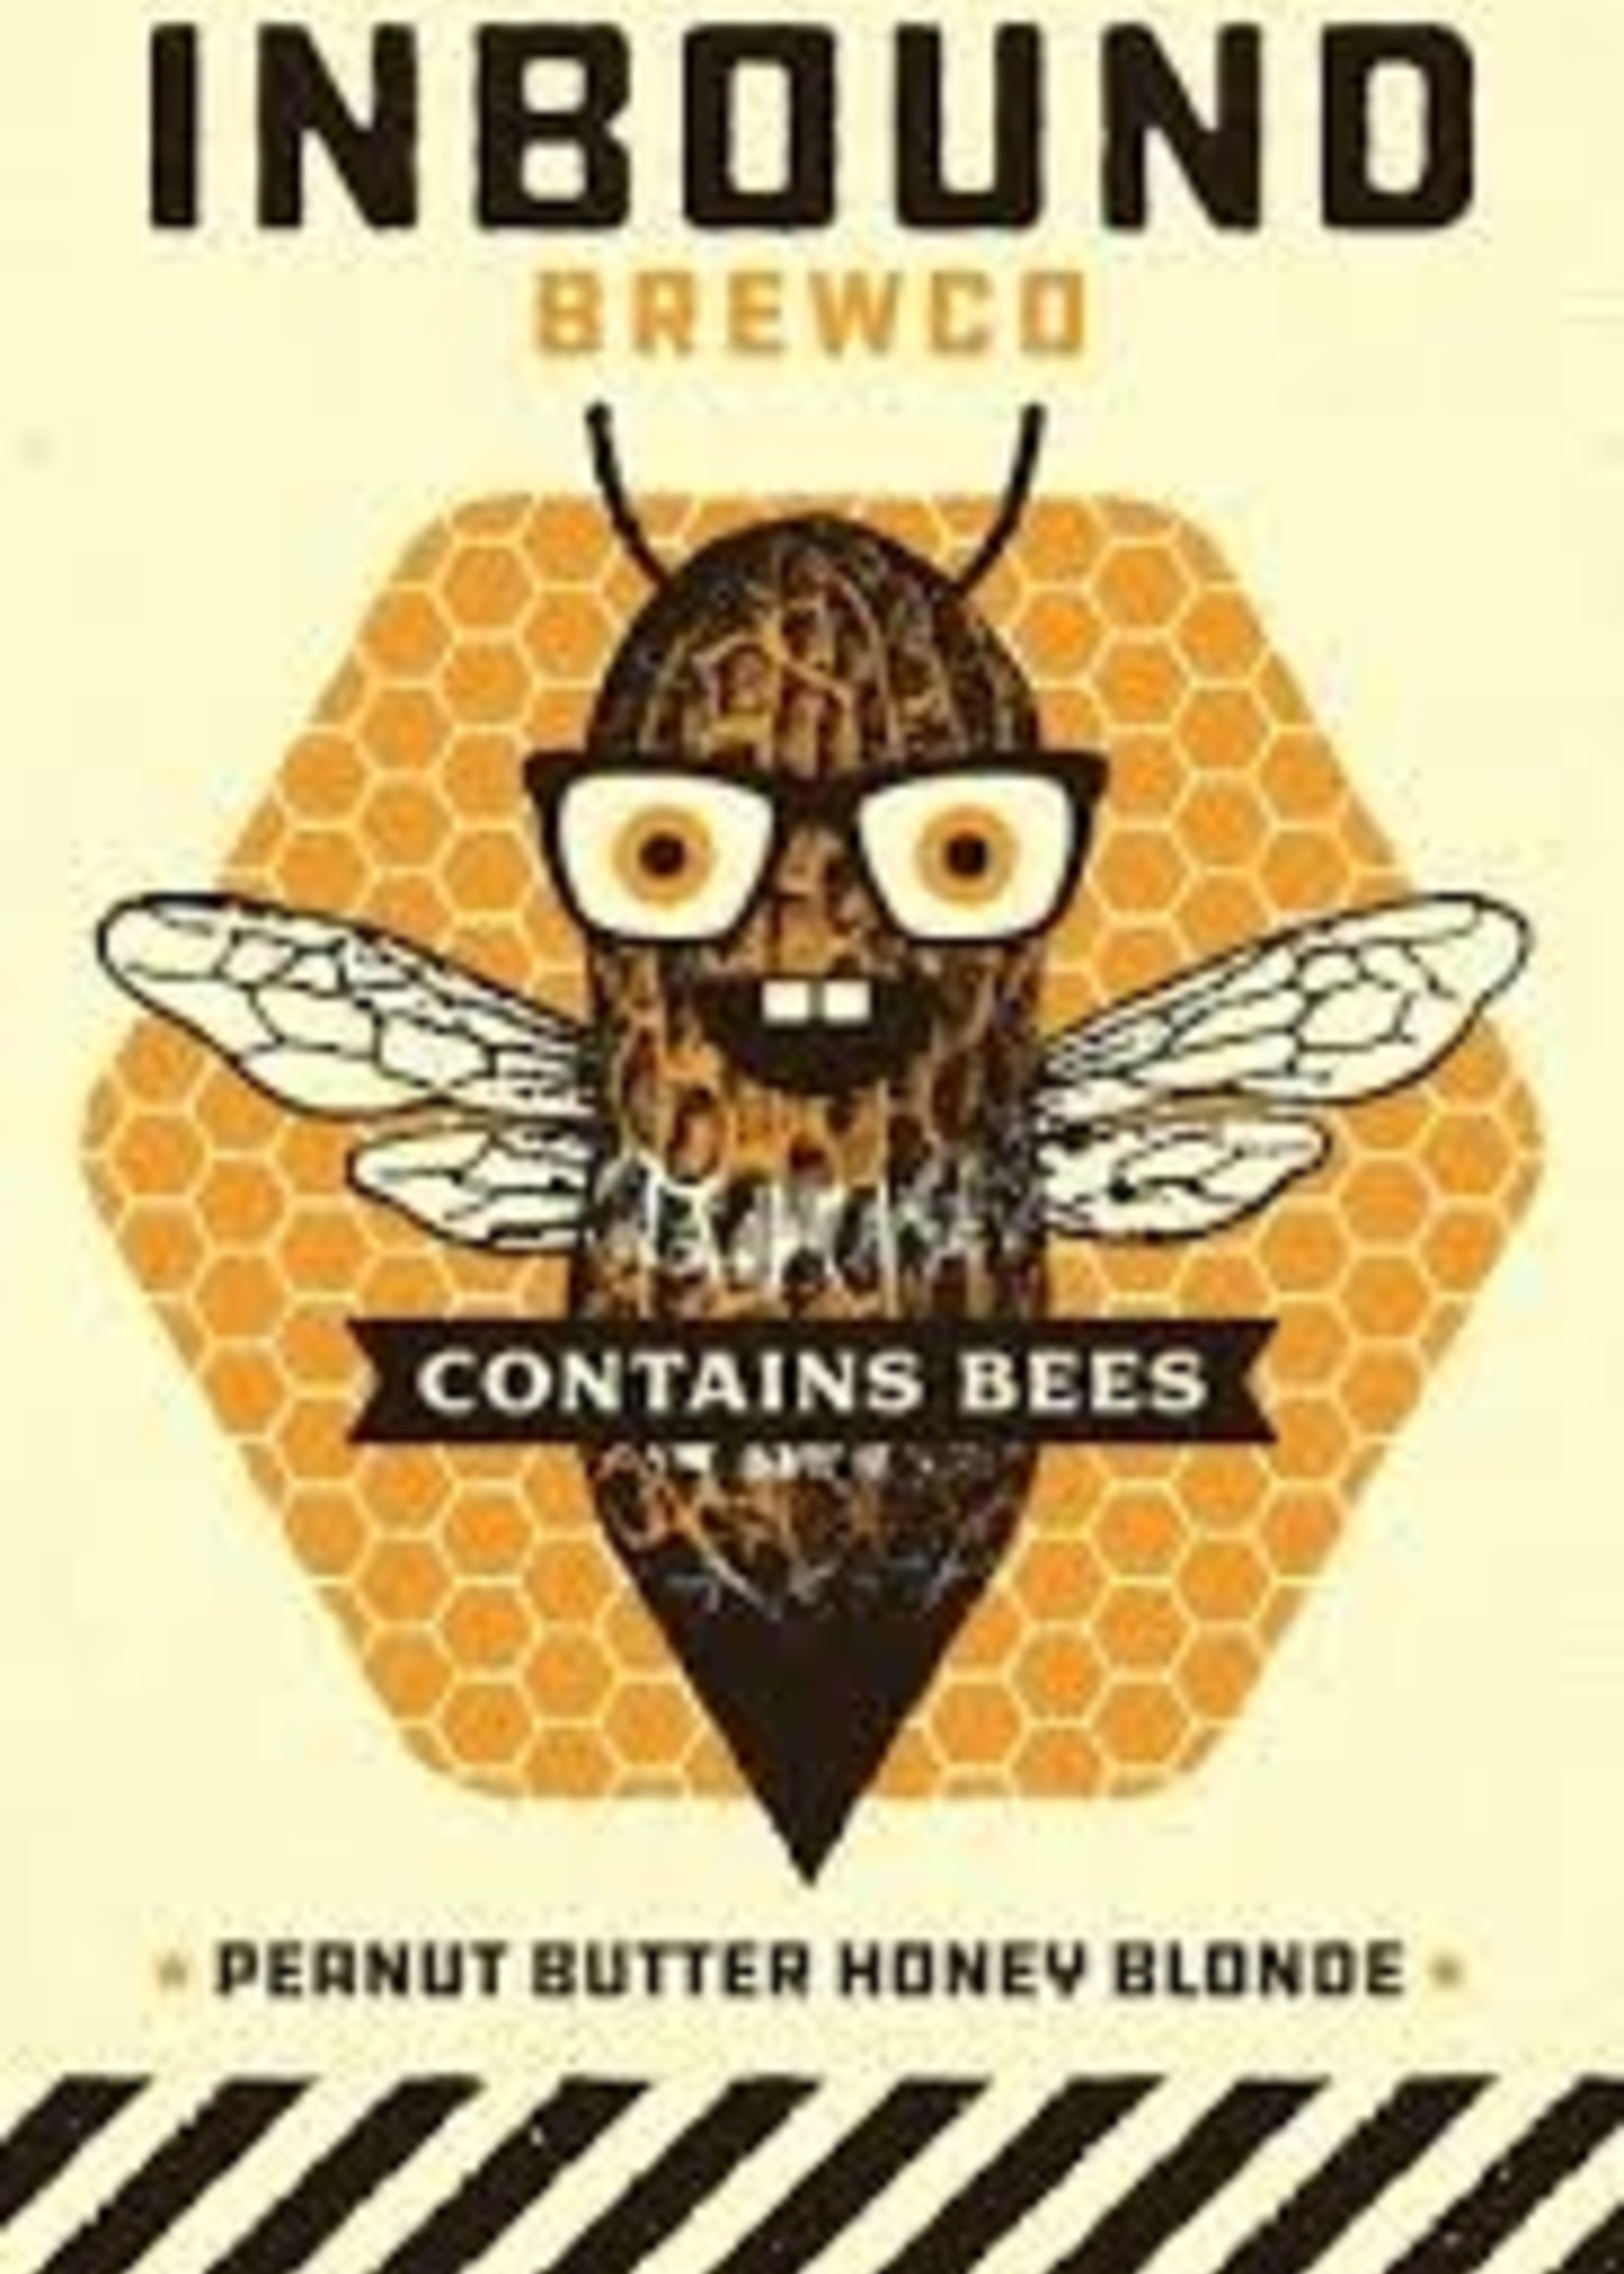 Inbound Contains Bees Peanut Butter Honey Blonde